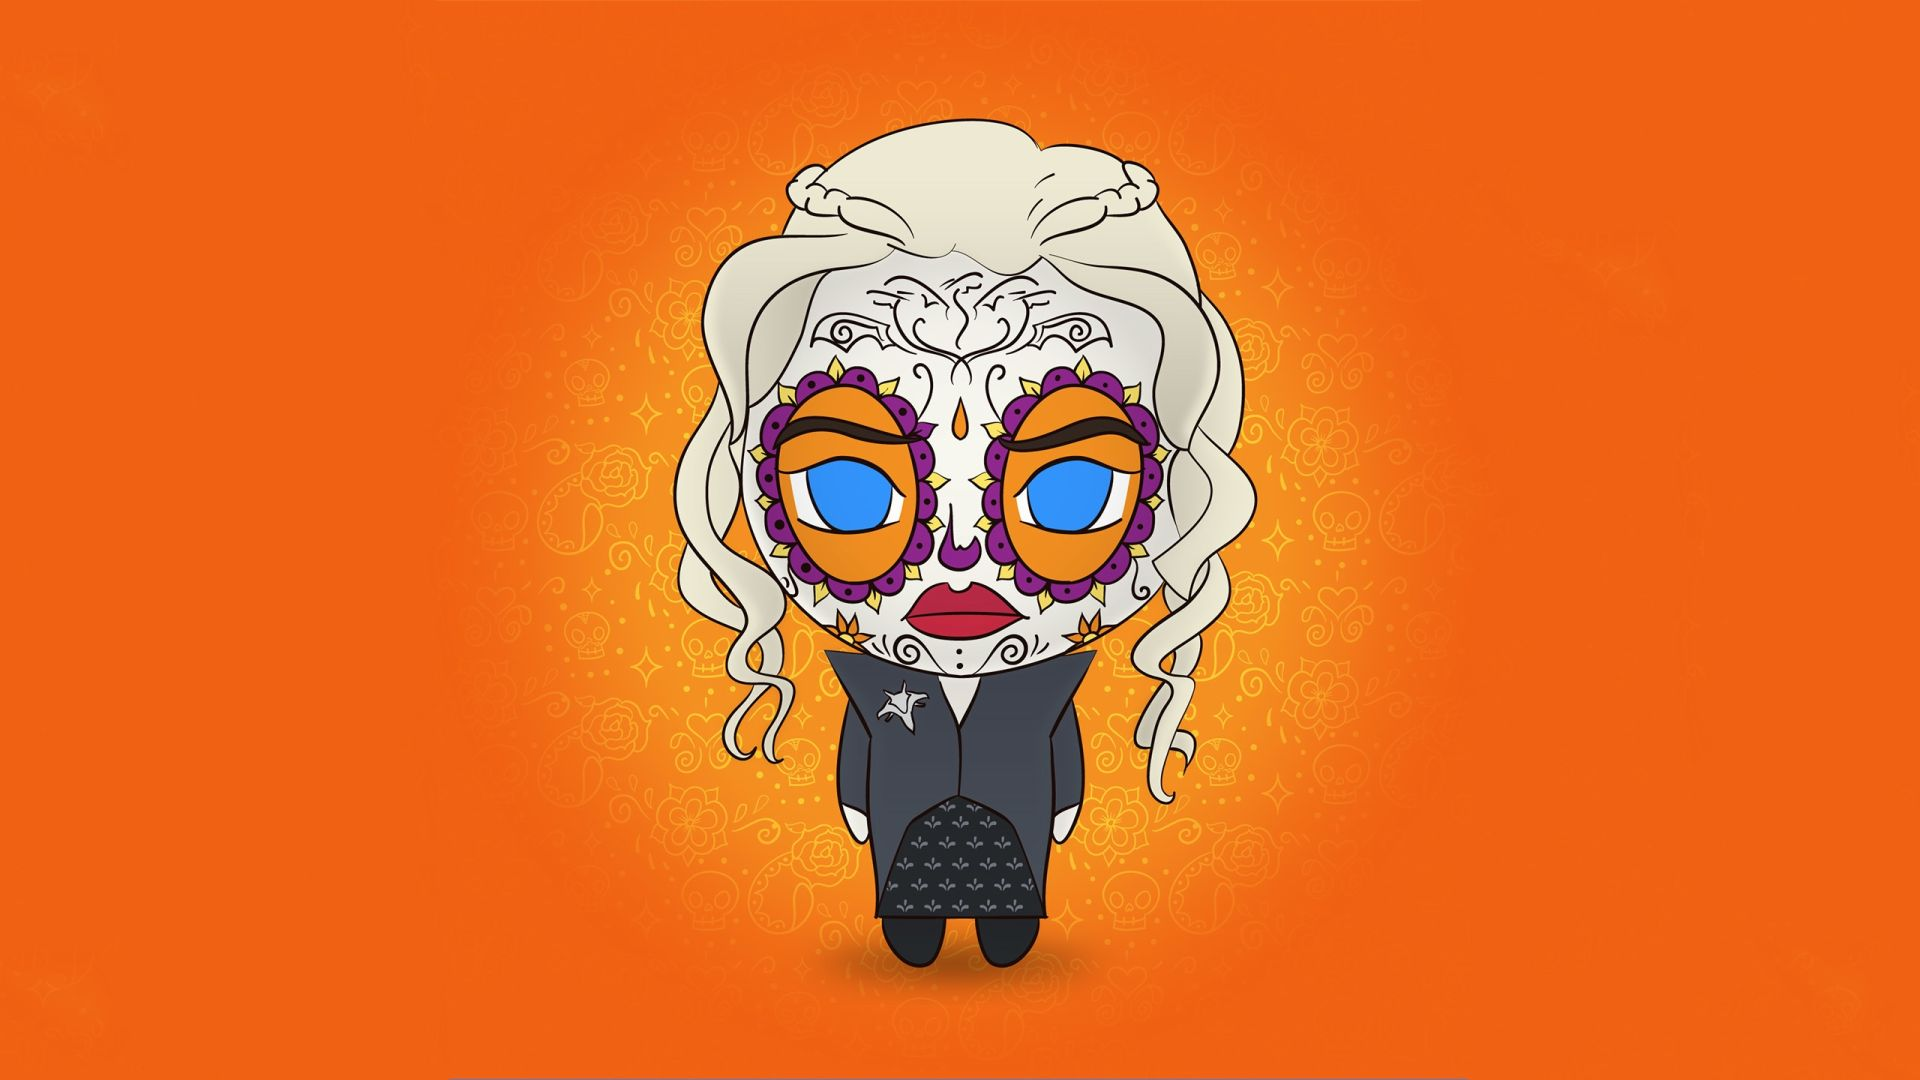 Game of Thrones chibi Daenerys illustration fan art